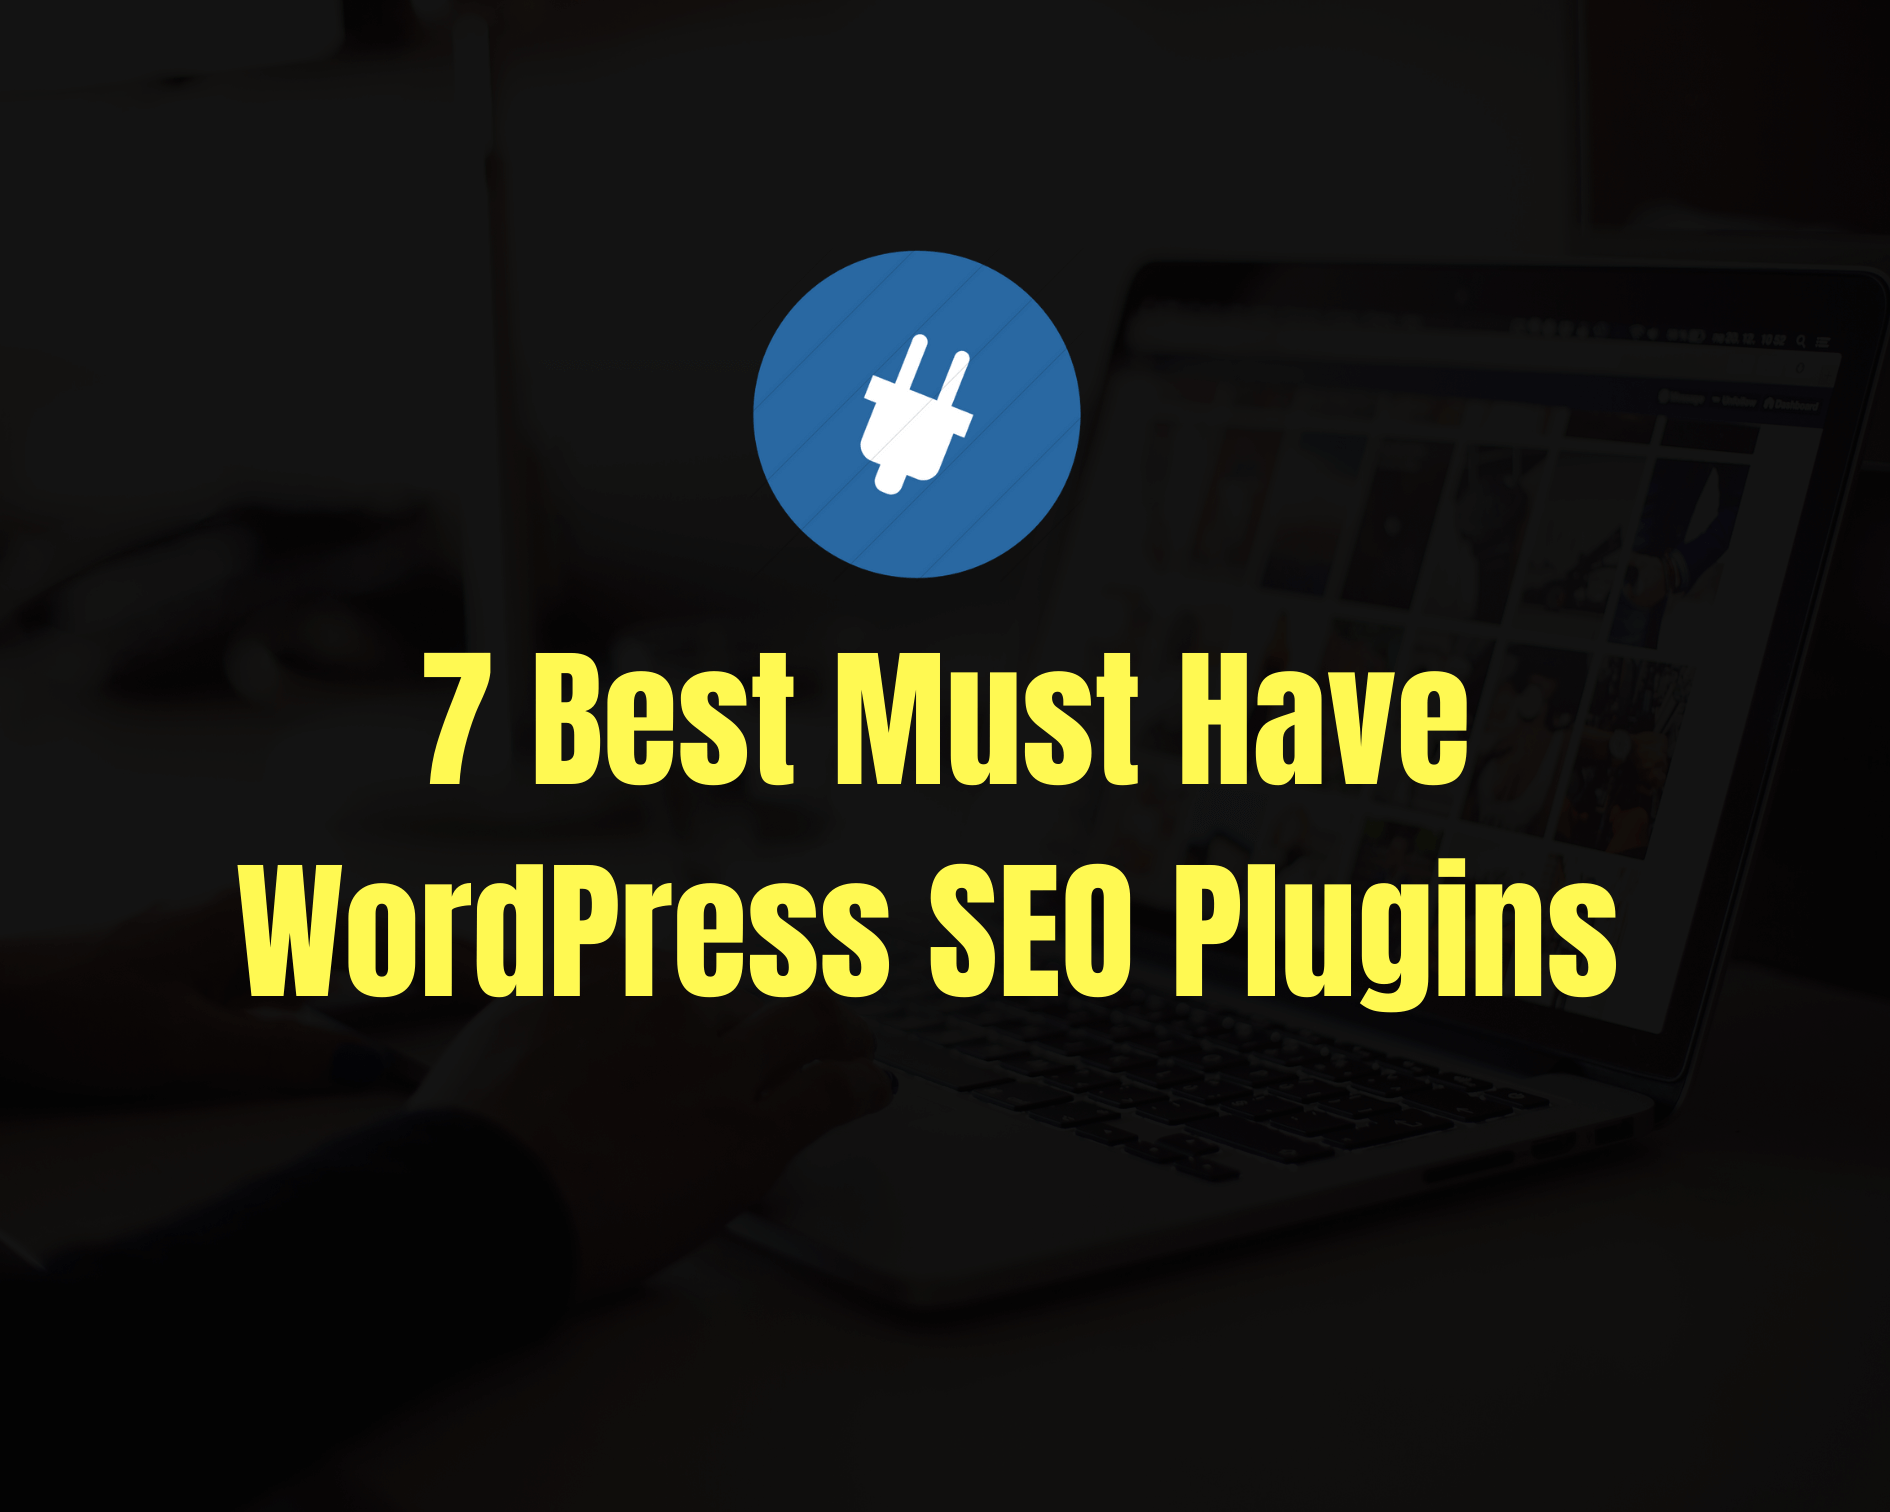 7 Best WordPress SEO Plugins You Must Have in 2020